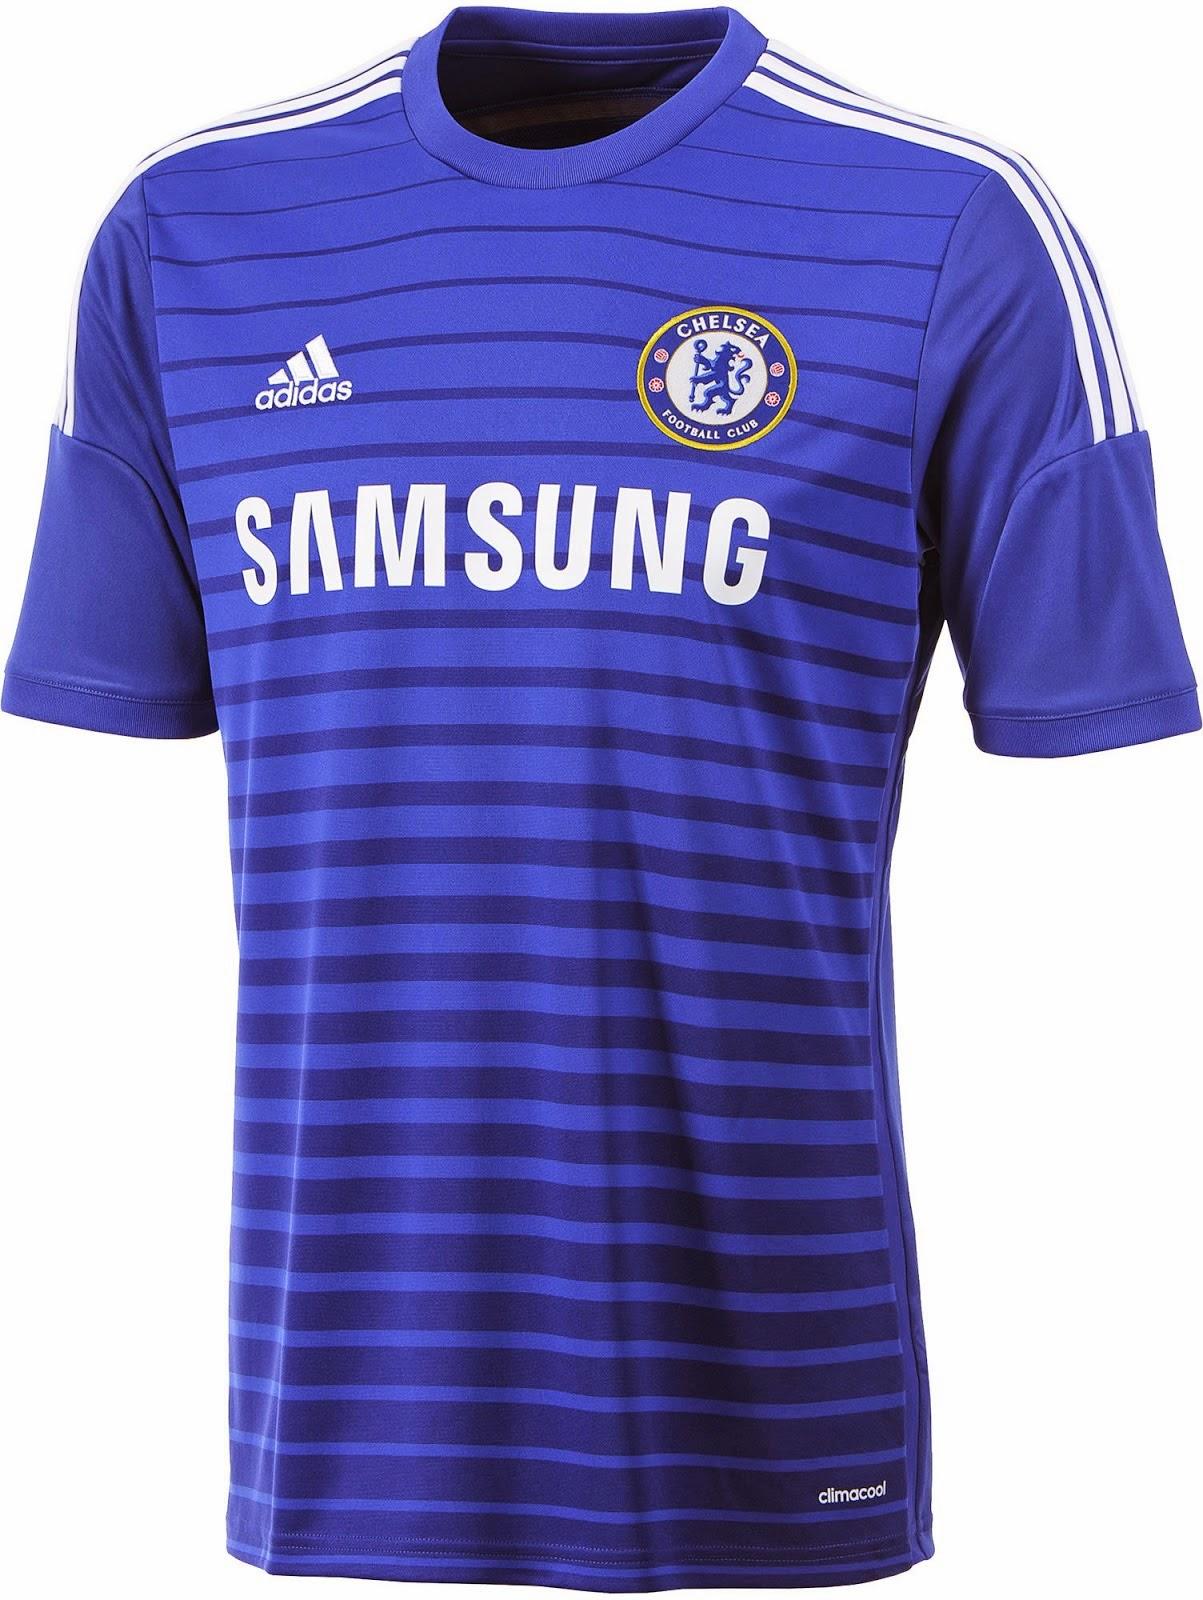 Jersey Chelsea 2014-2015 terbaru